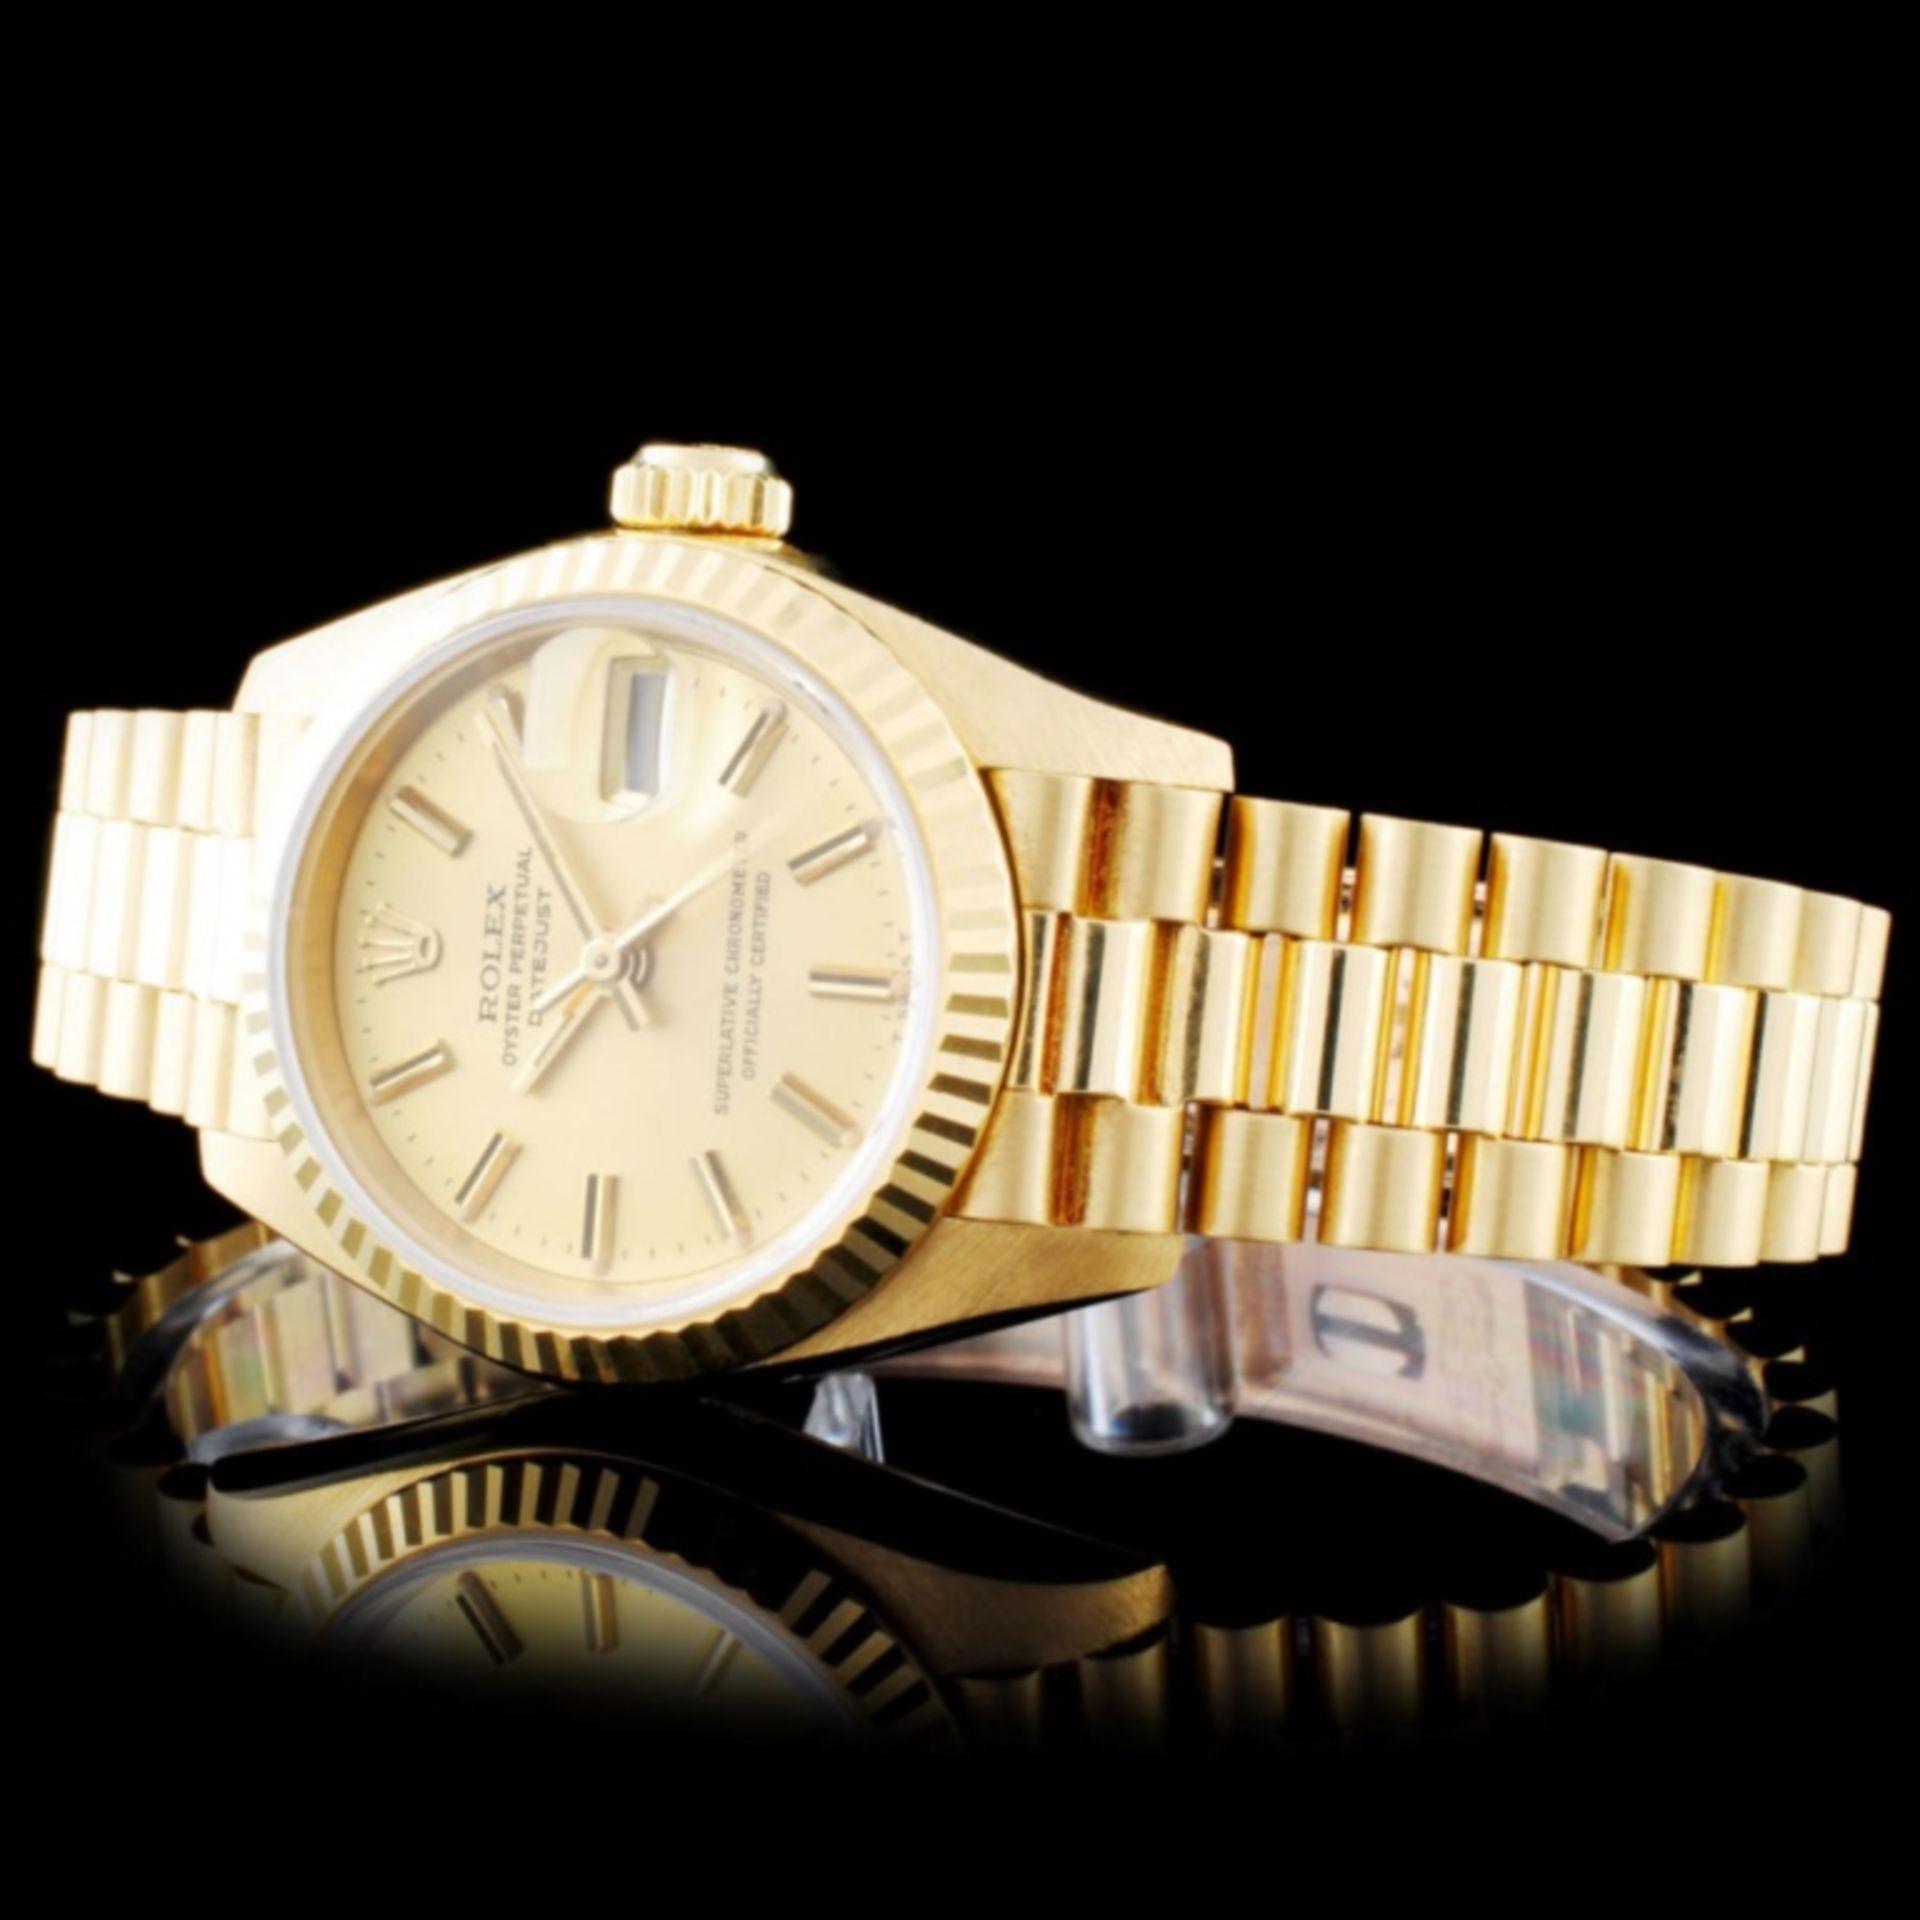 Rolex 18K Gold Presidential Ladies Wristwatch - Image 2 of 5